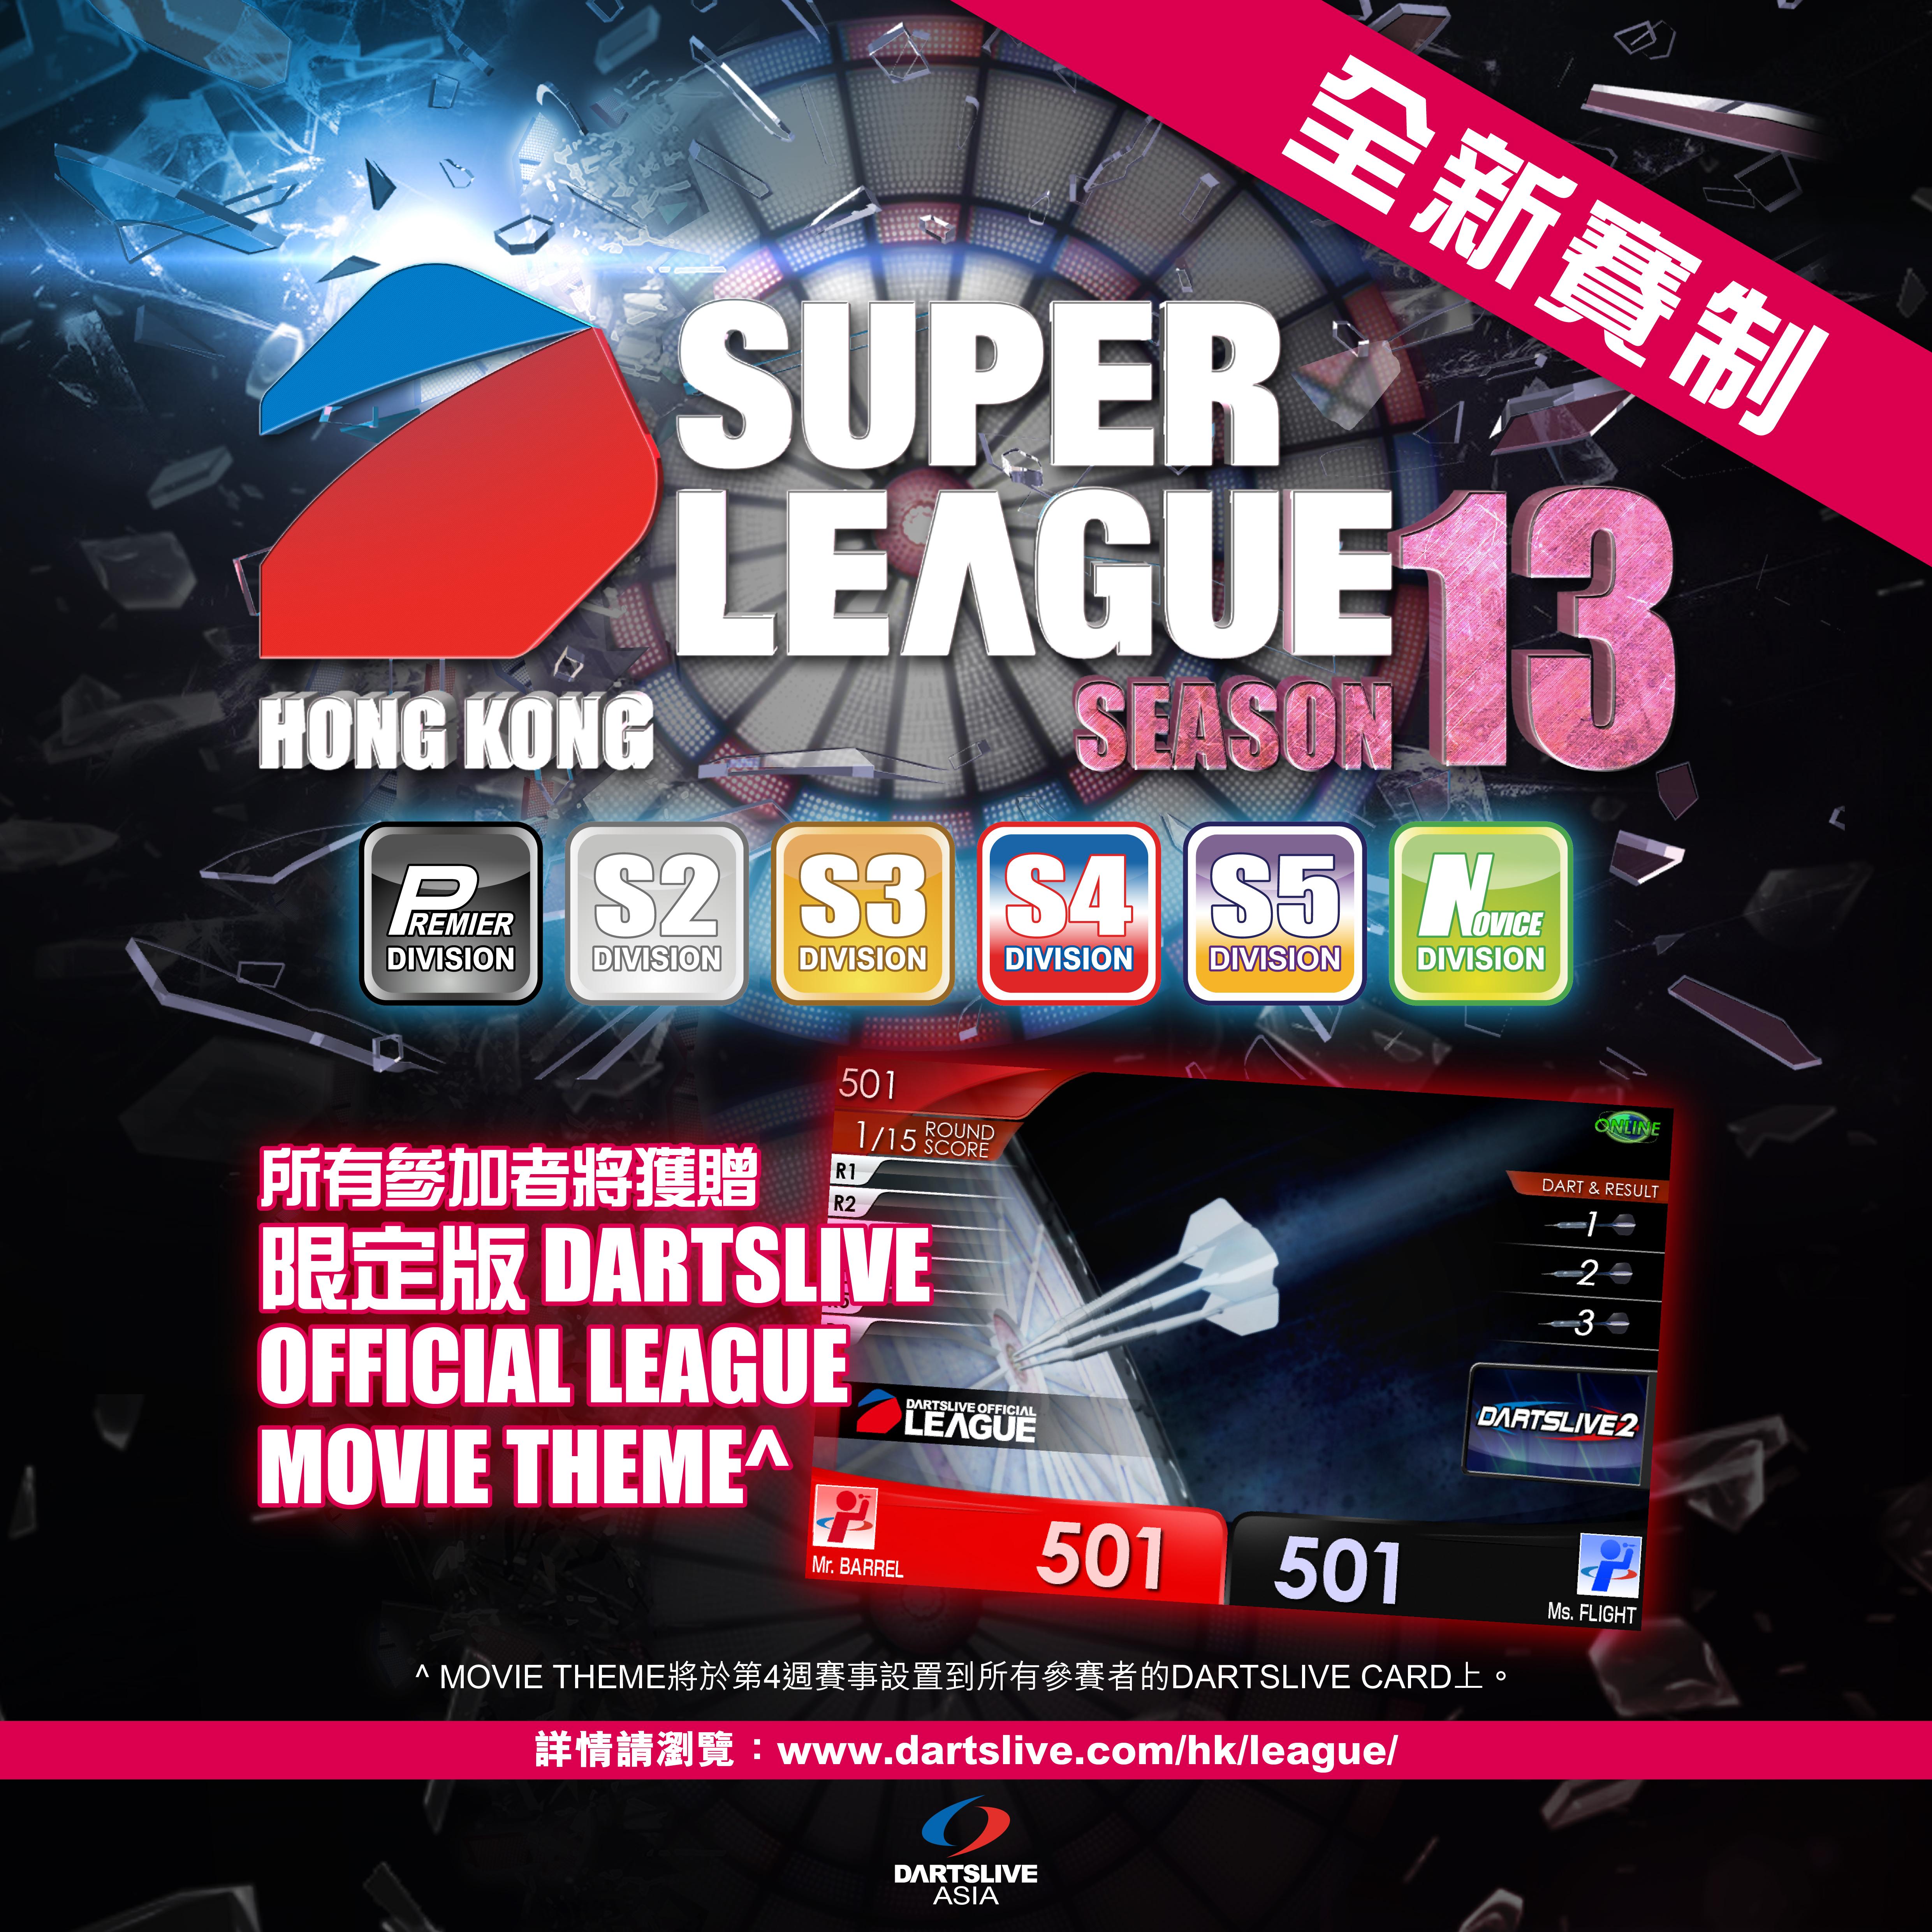 SUPER LEAUGE SEASON 13 Theme News